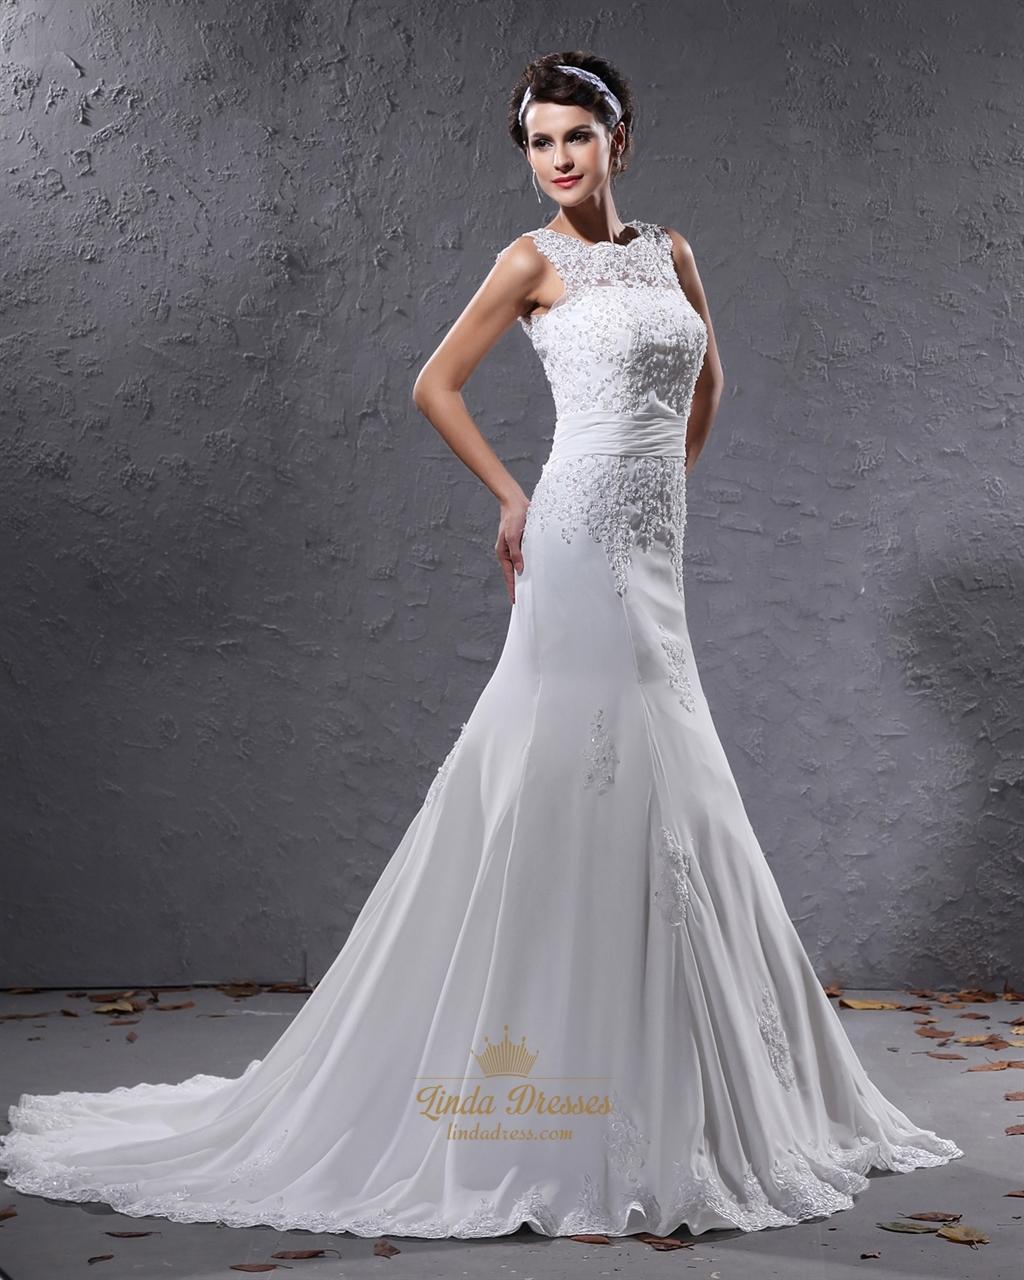 Ivory Mermaid Illusion Neckline Wedding Dresses With Lace